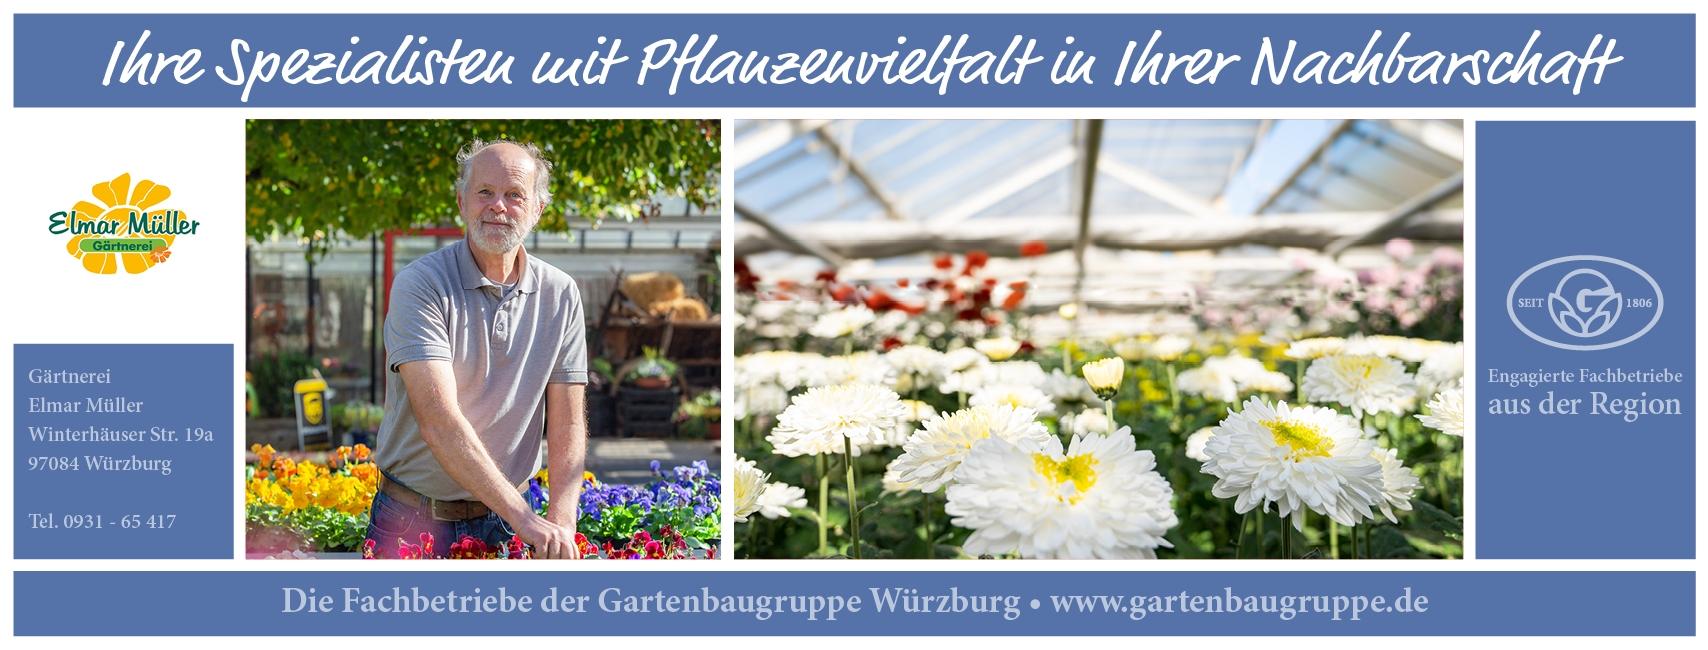 Gärtnerei Elmar Müller - Gartenbaugruppe Würzburg